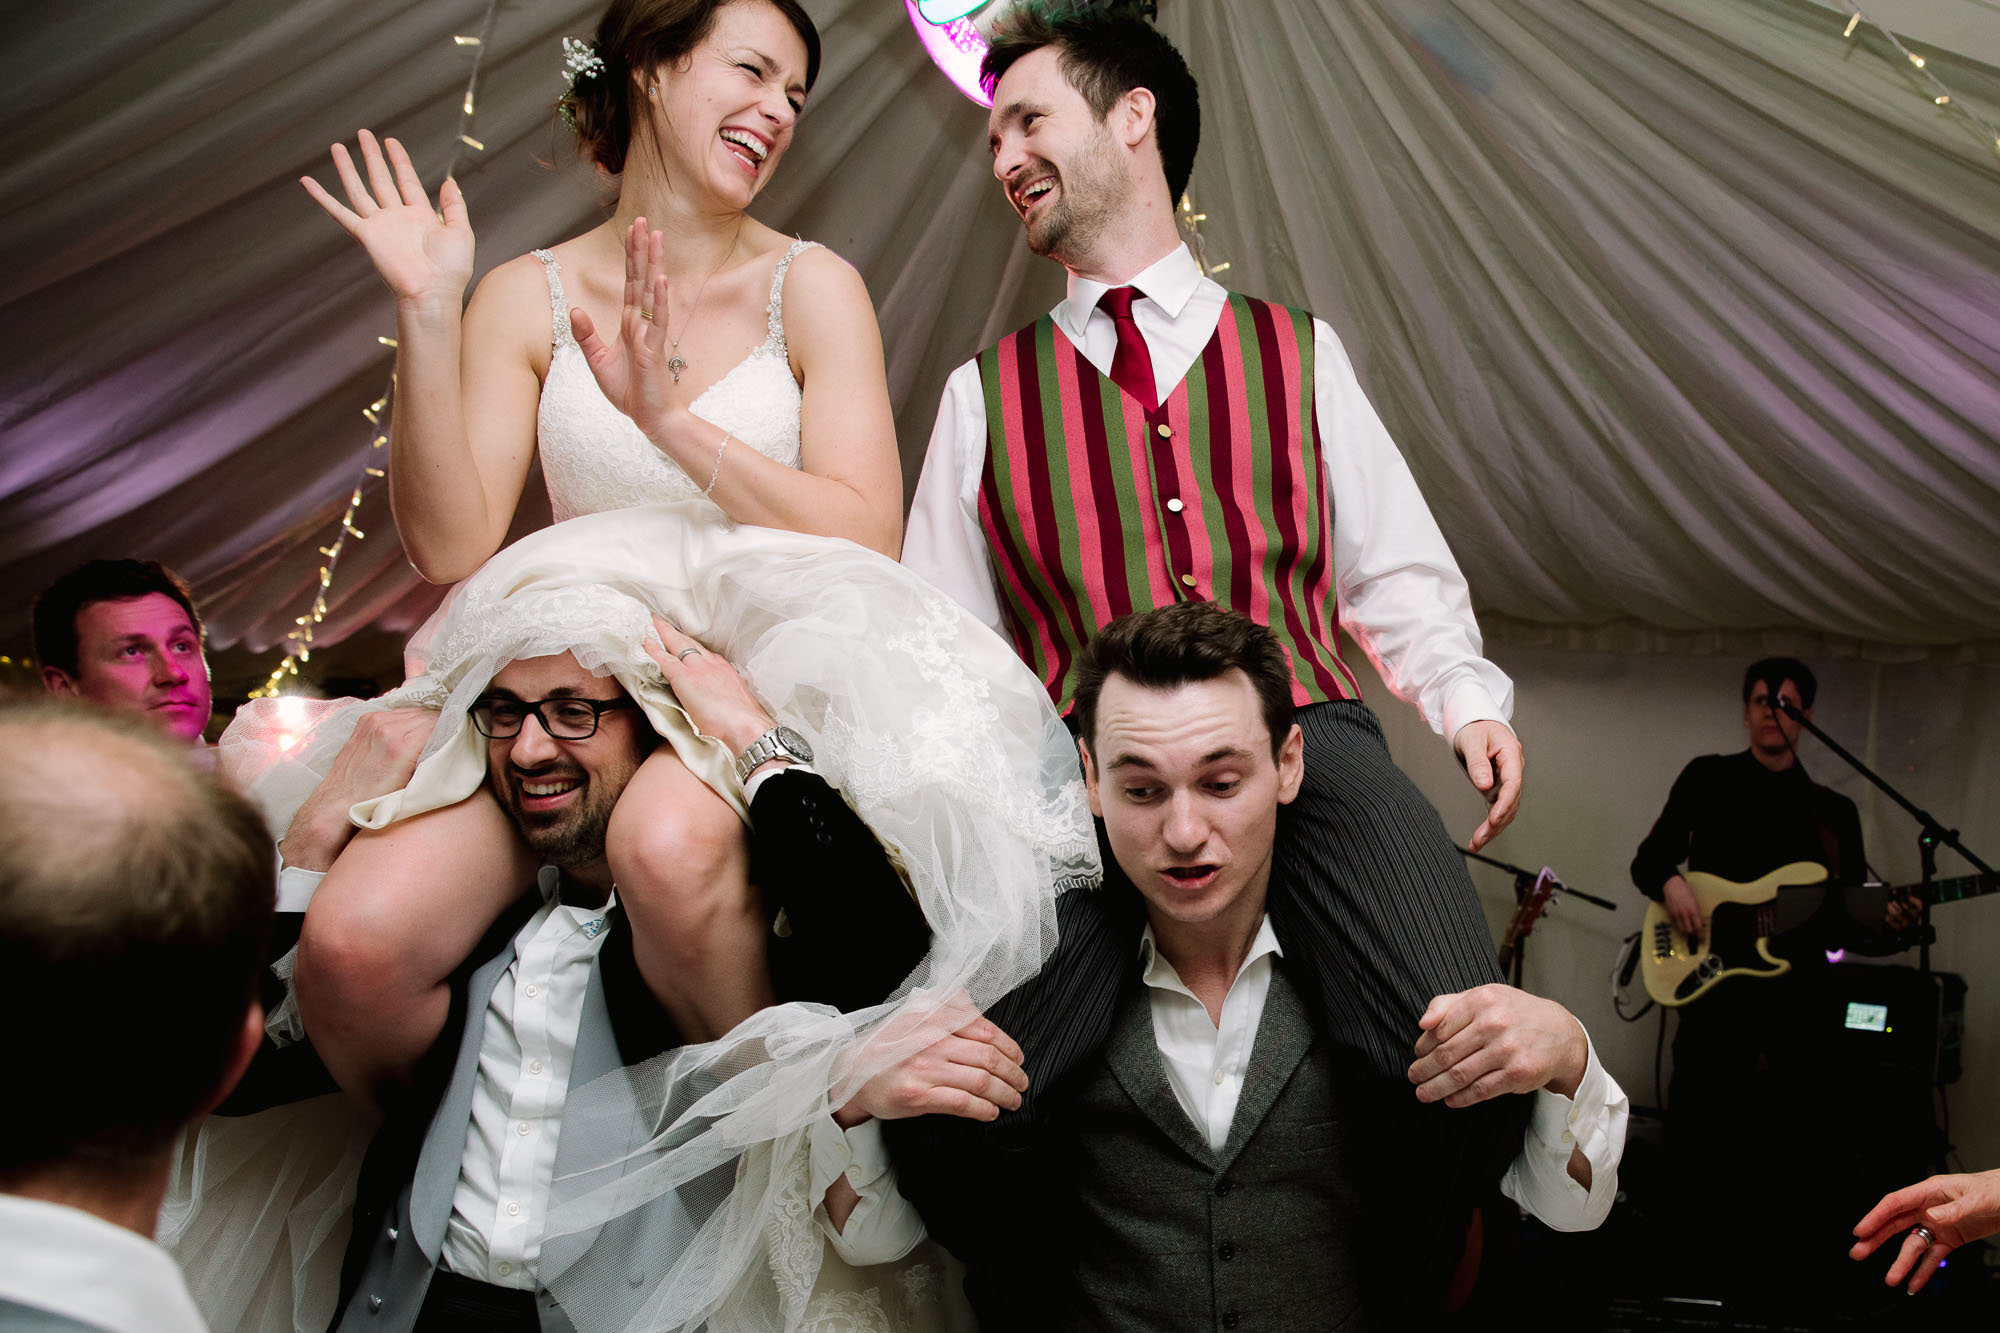 BRIDE AND GROOM WEDDING DANCING